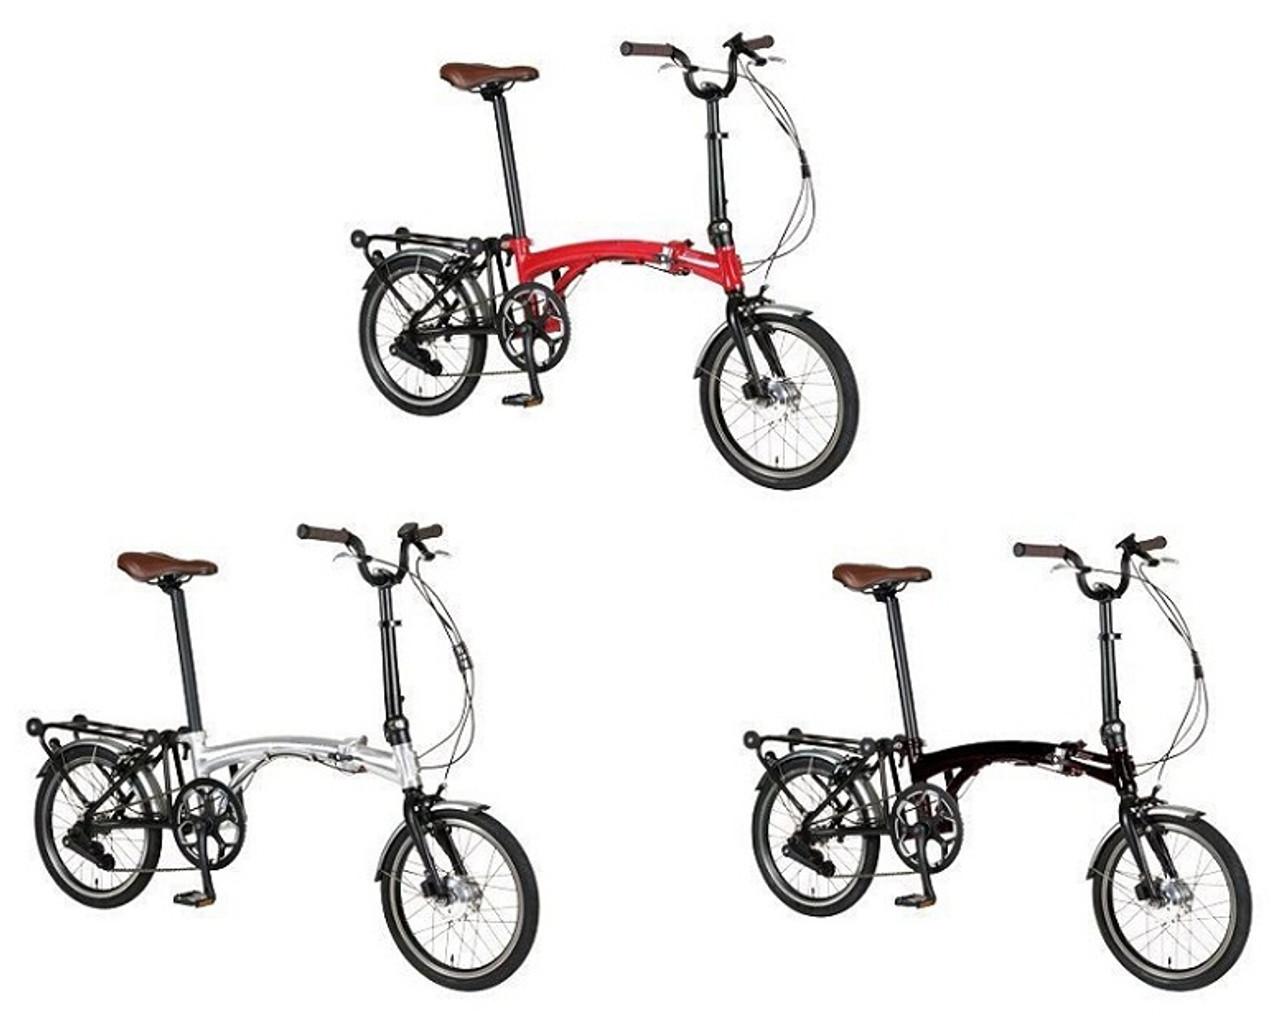 ROKETA ELECTRIC FOLDING BICYCLE